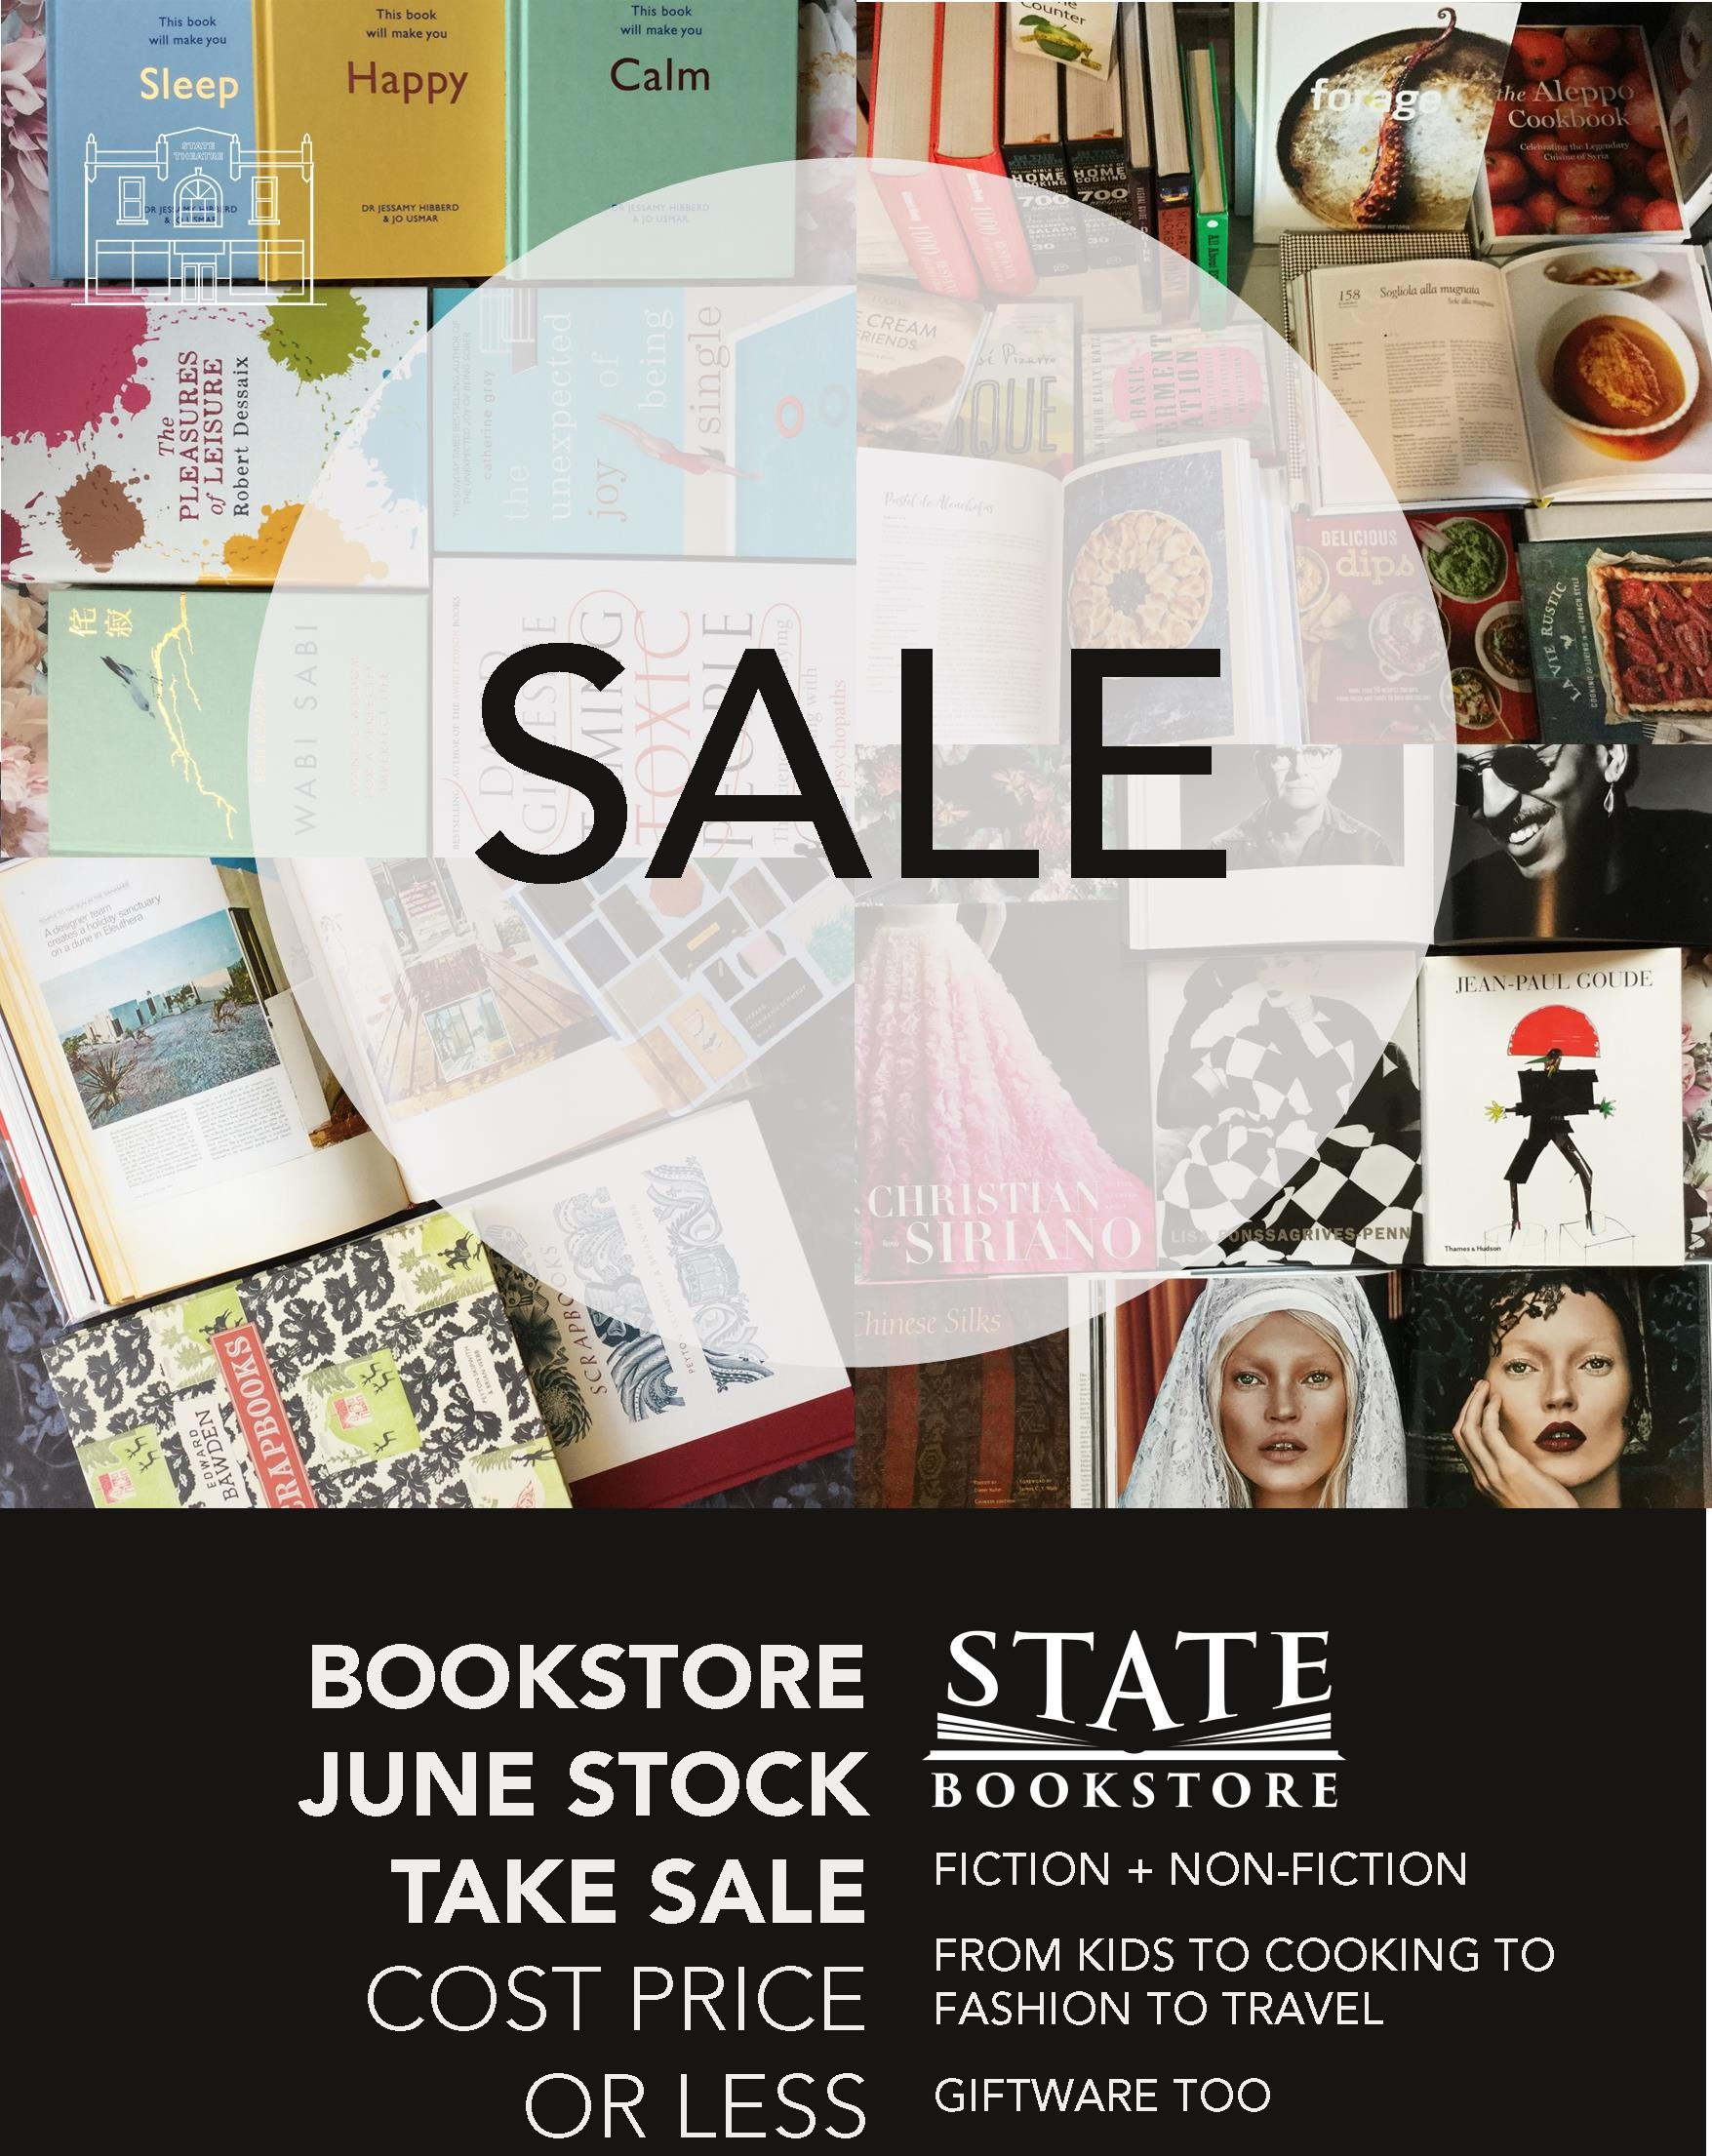 Bookstore+Stock+Sale+Poster.jpg